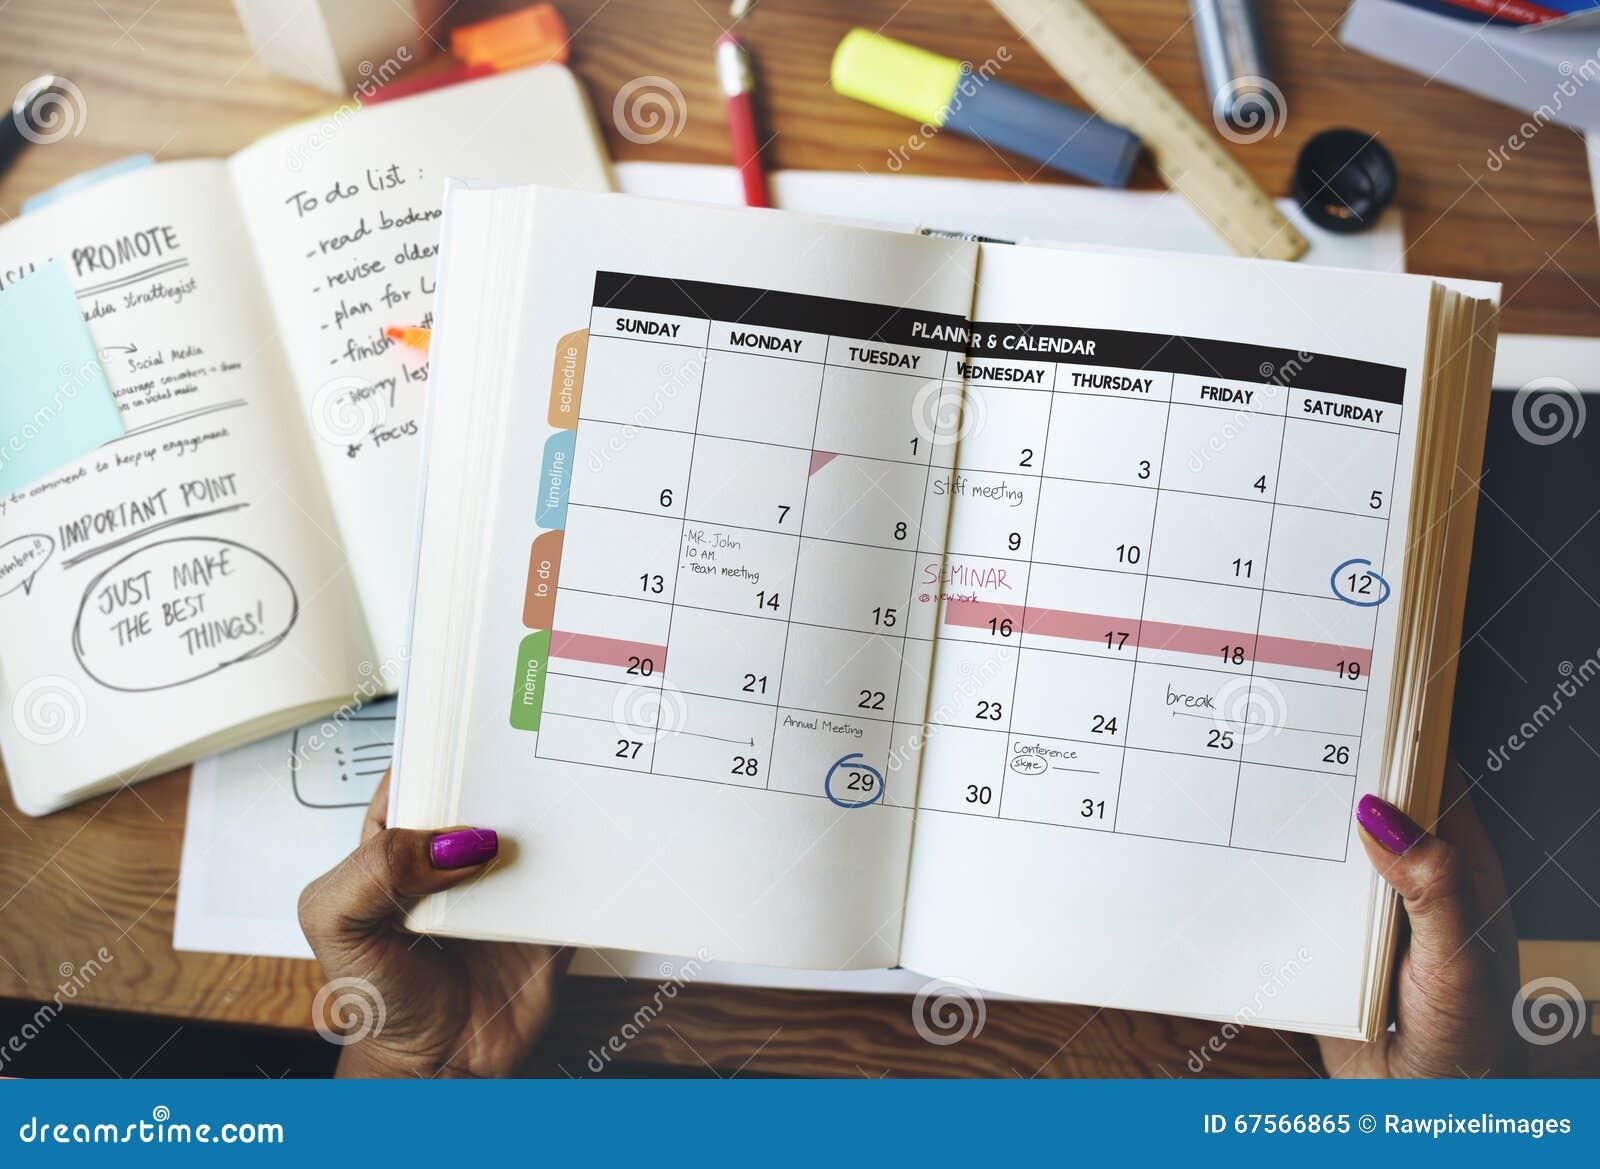 kalender planer organisations management erinnern konzept stockbild bild von notizblock. Black Bedroom Furniture Sets. Home Design Ideas